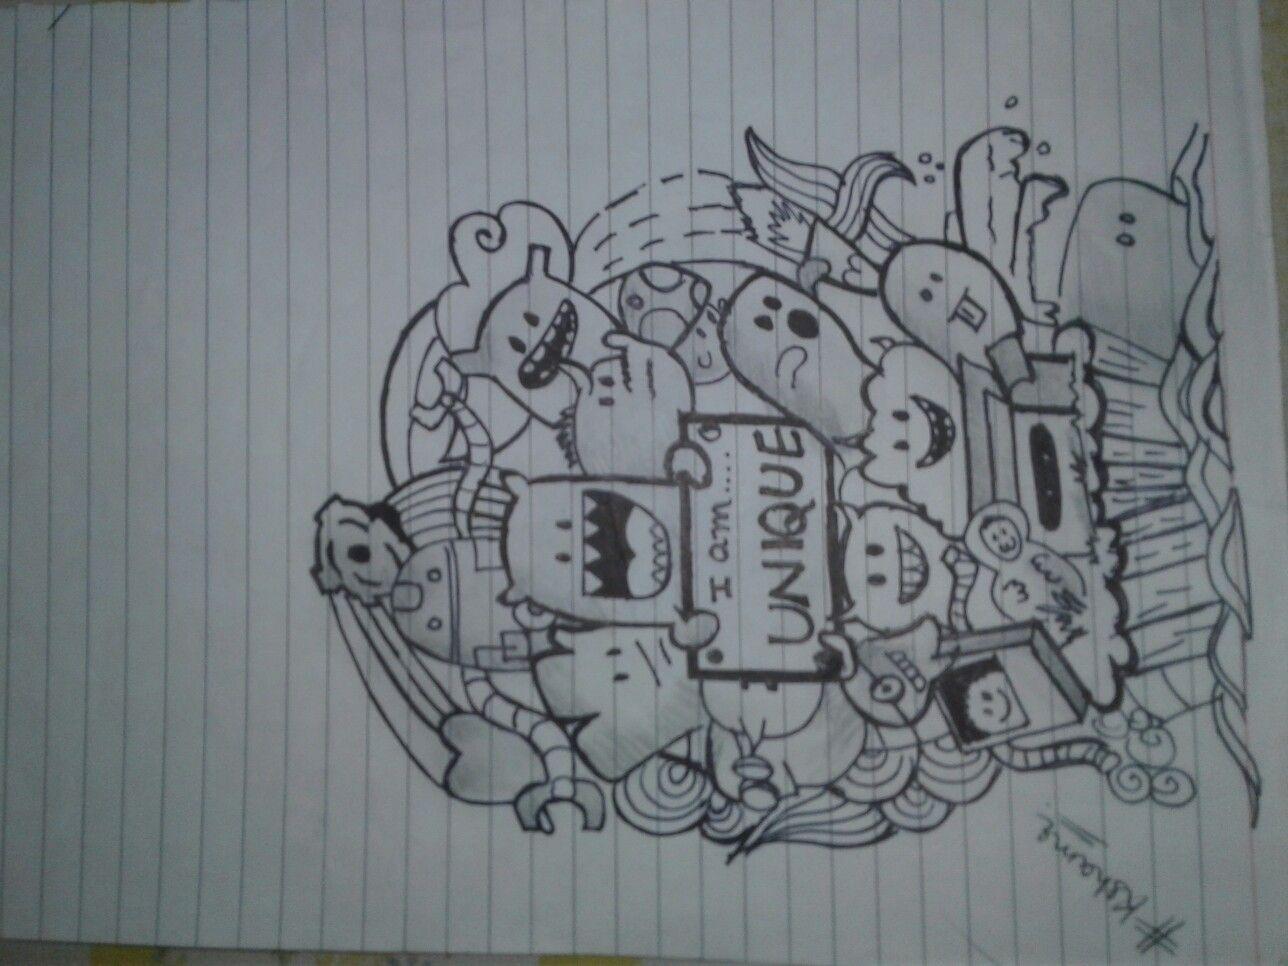 Pin by kshama singhal on doodle pinterest doodles